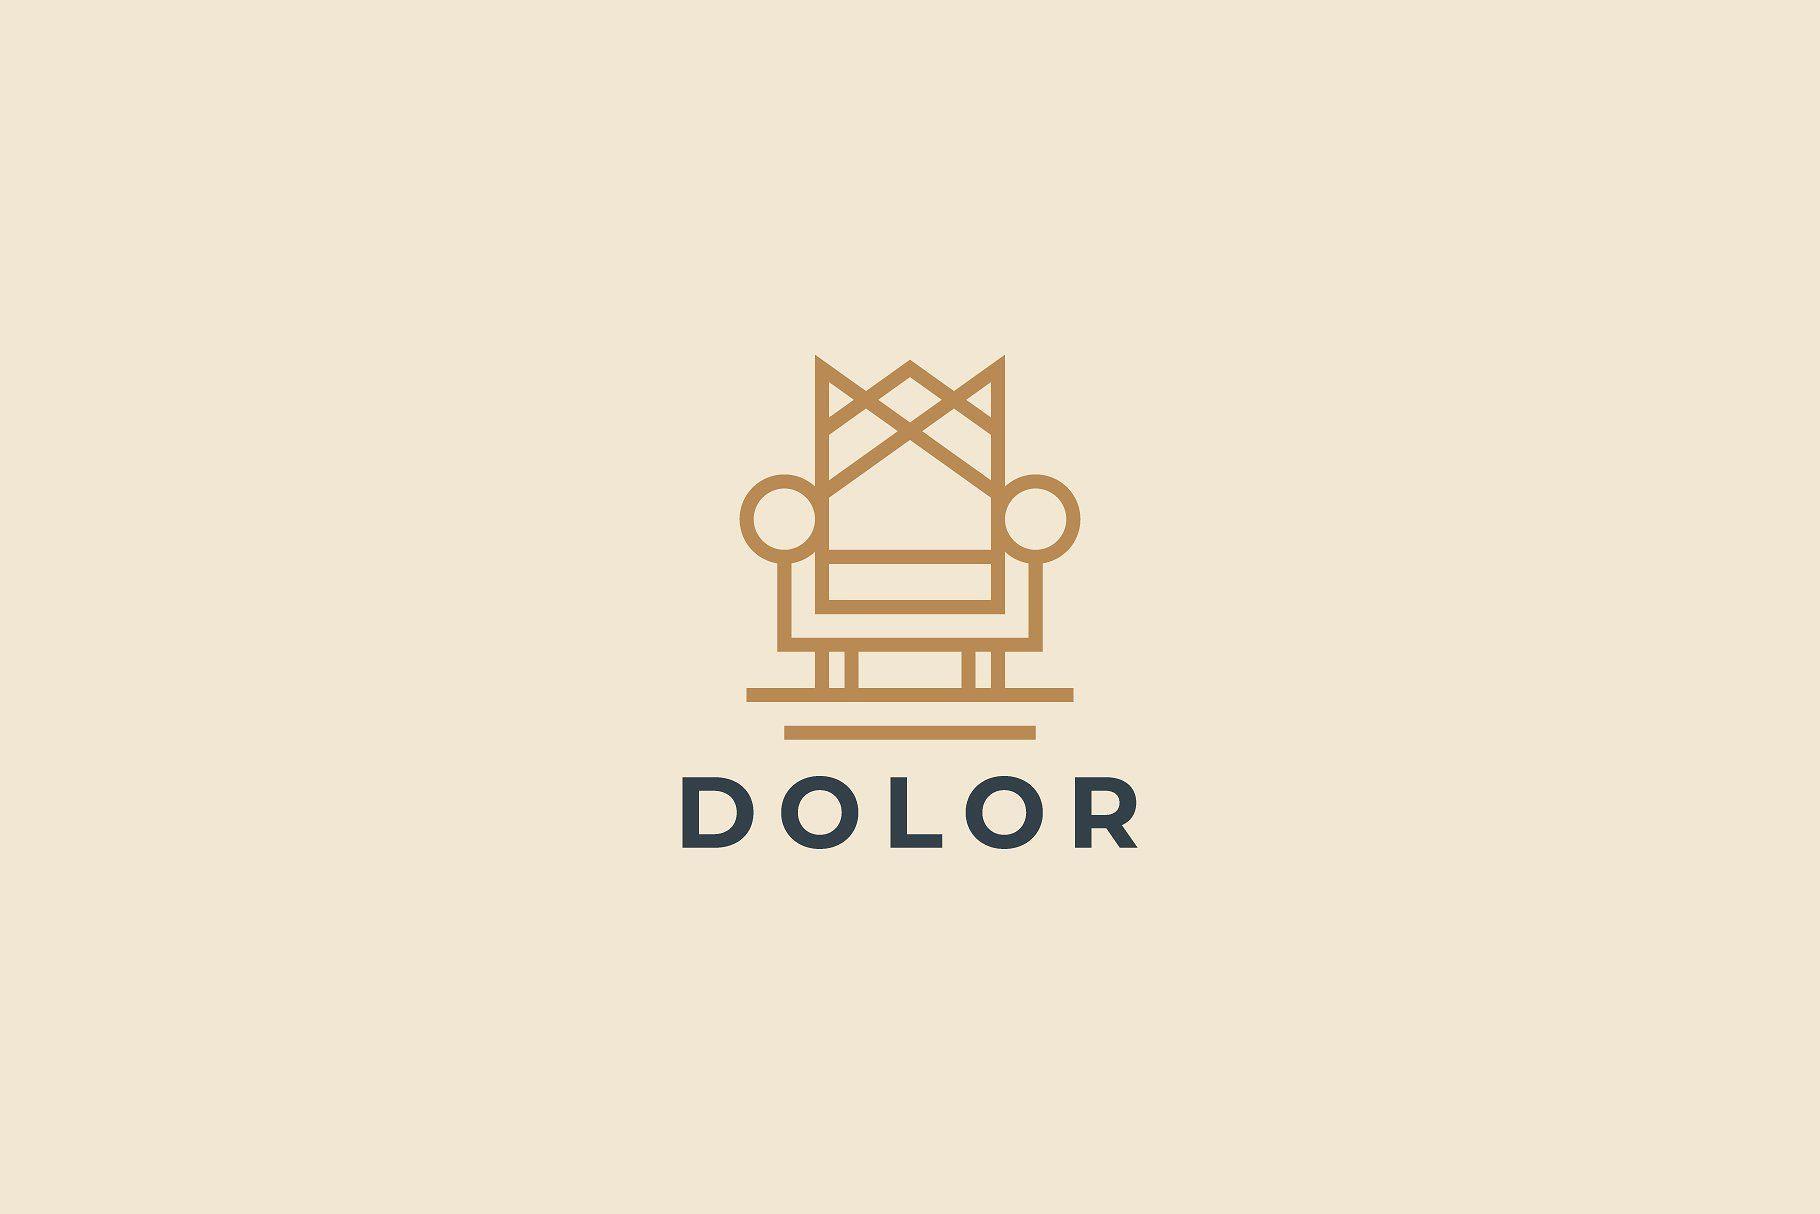 Throne Logotype In 2020 Boutique Logo Design Logo Design Furniture Logo